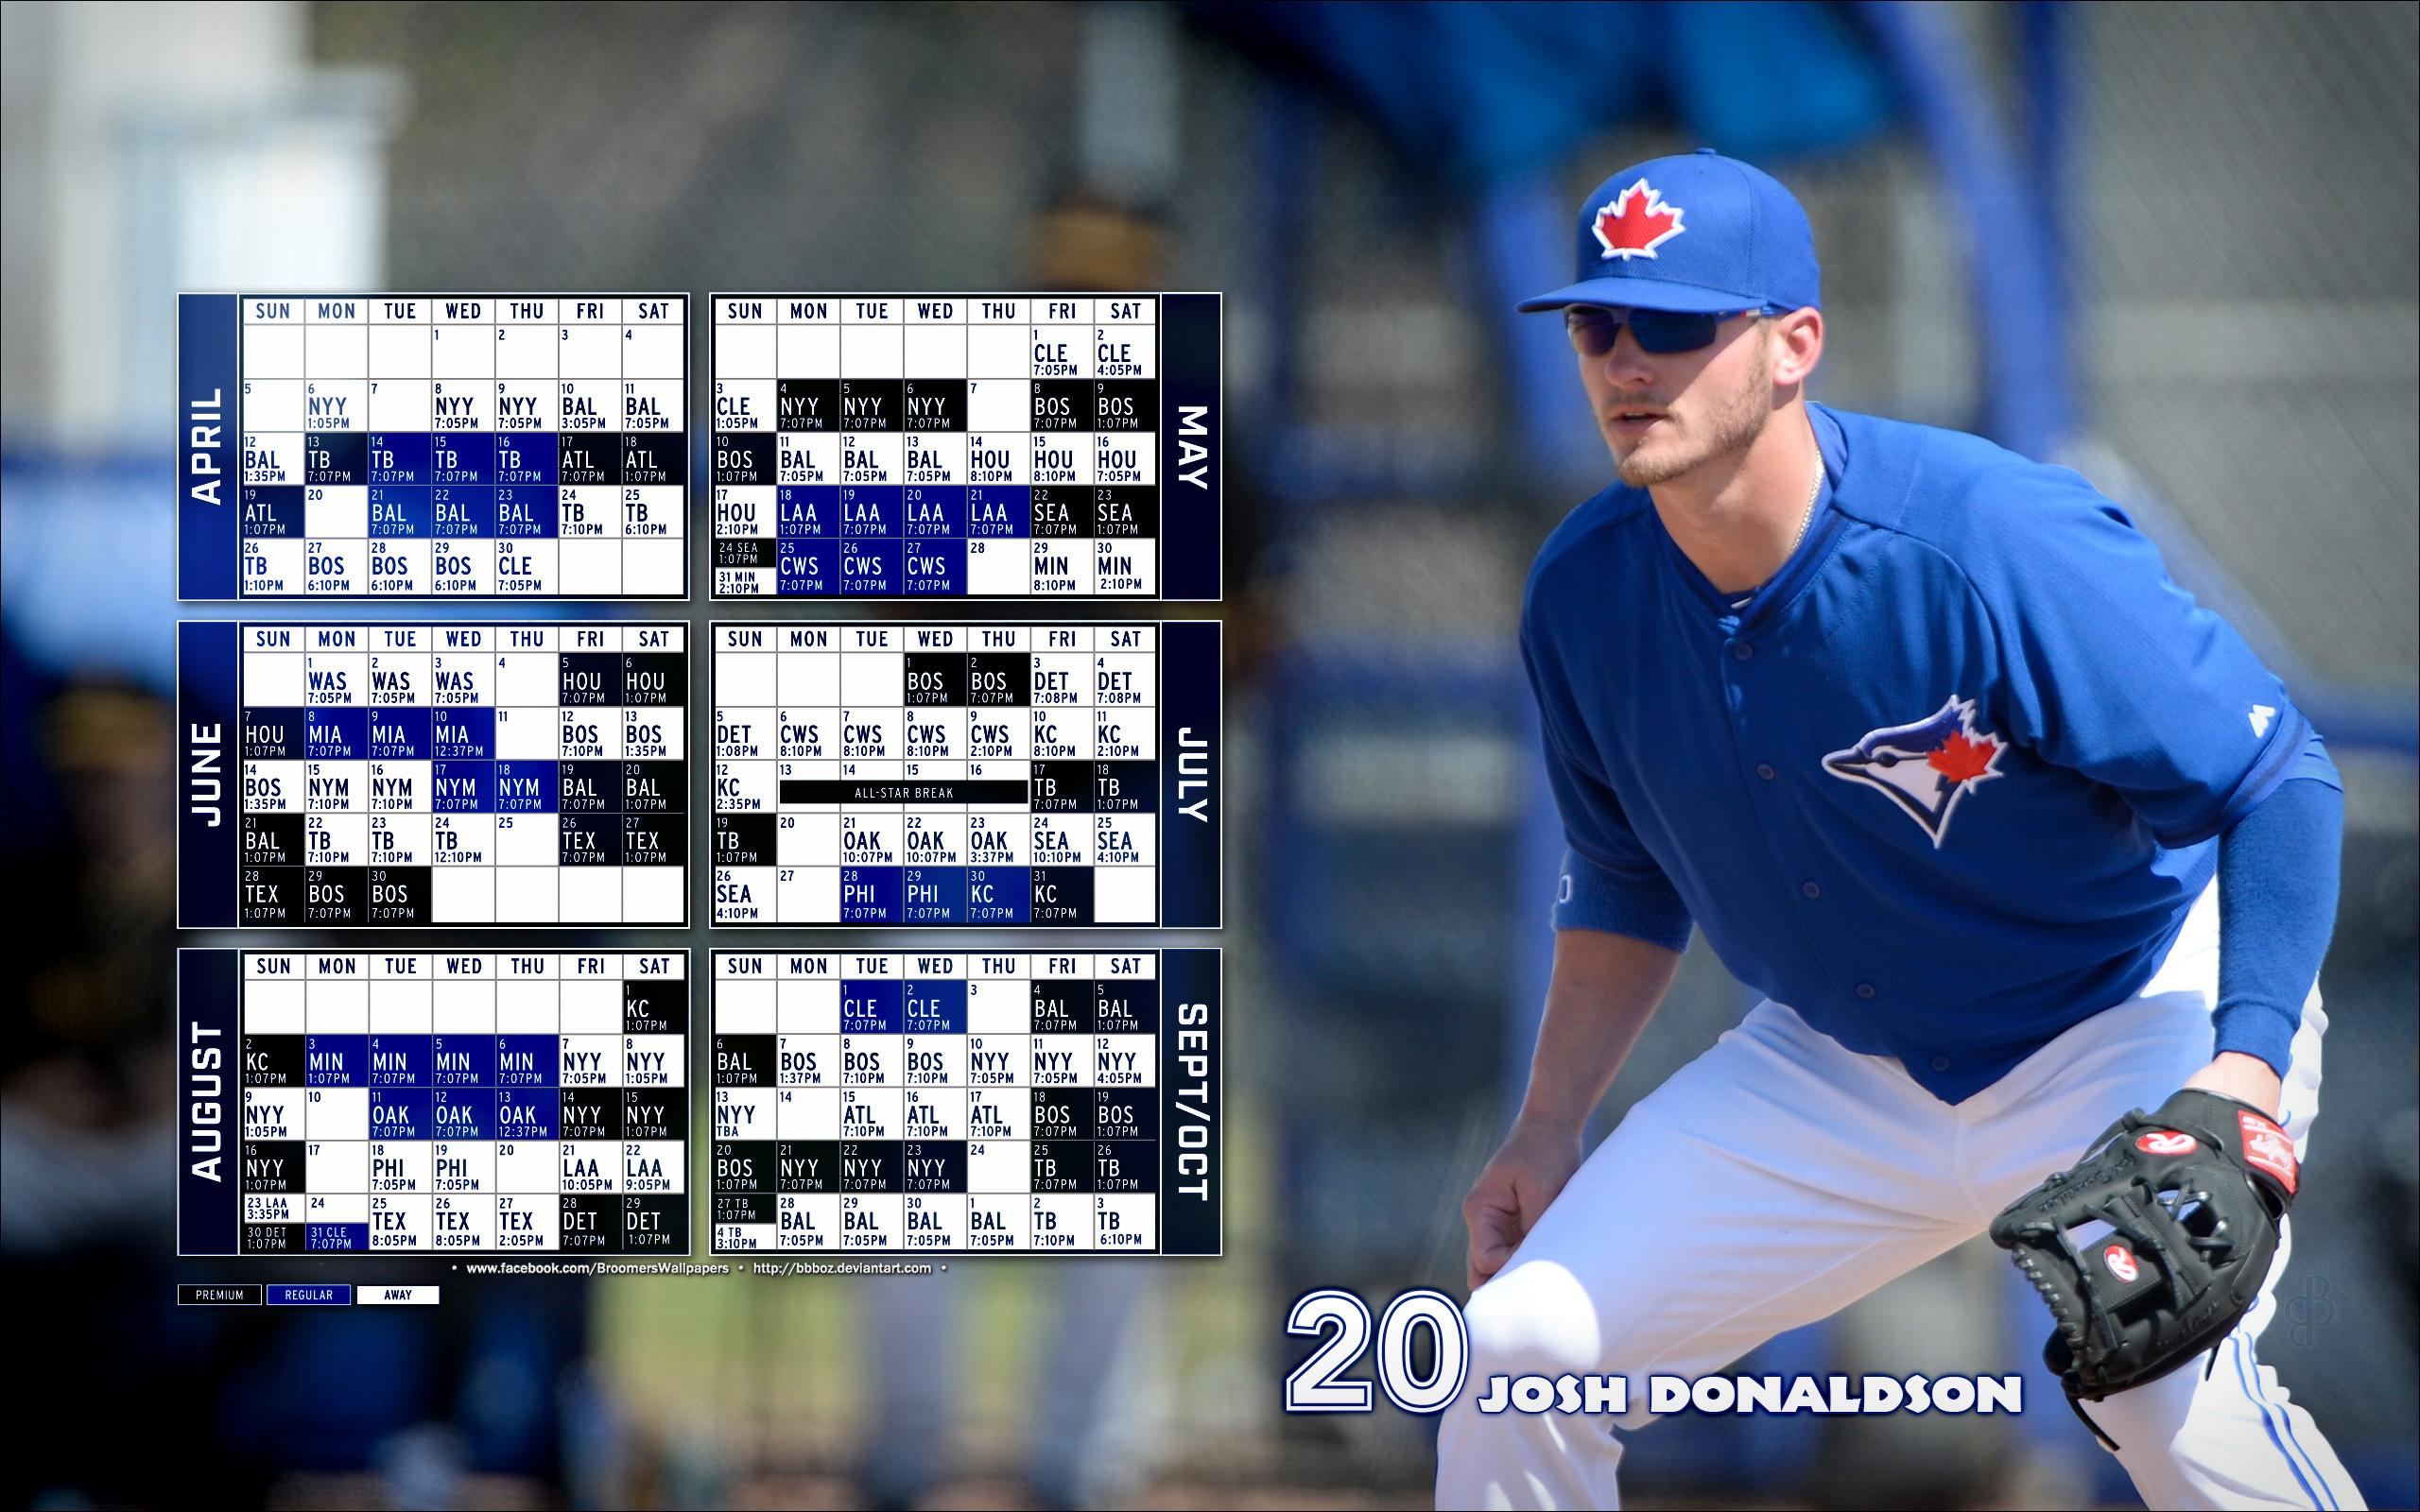 … 2015 Toronto Blue Jays schedule Wallpaper by bbboz